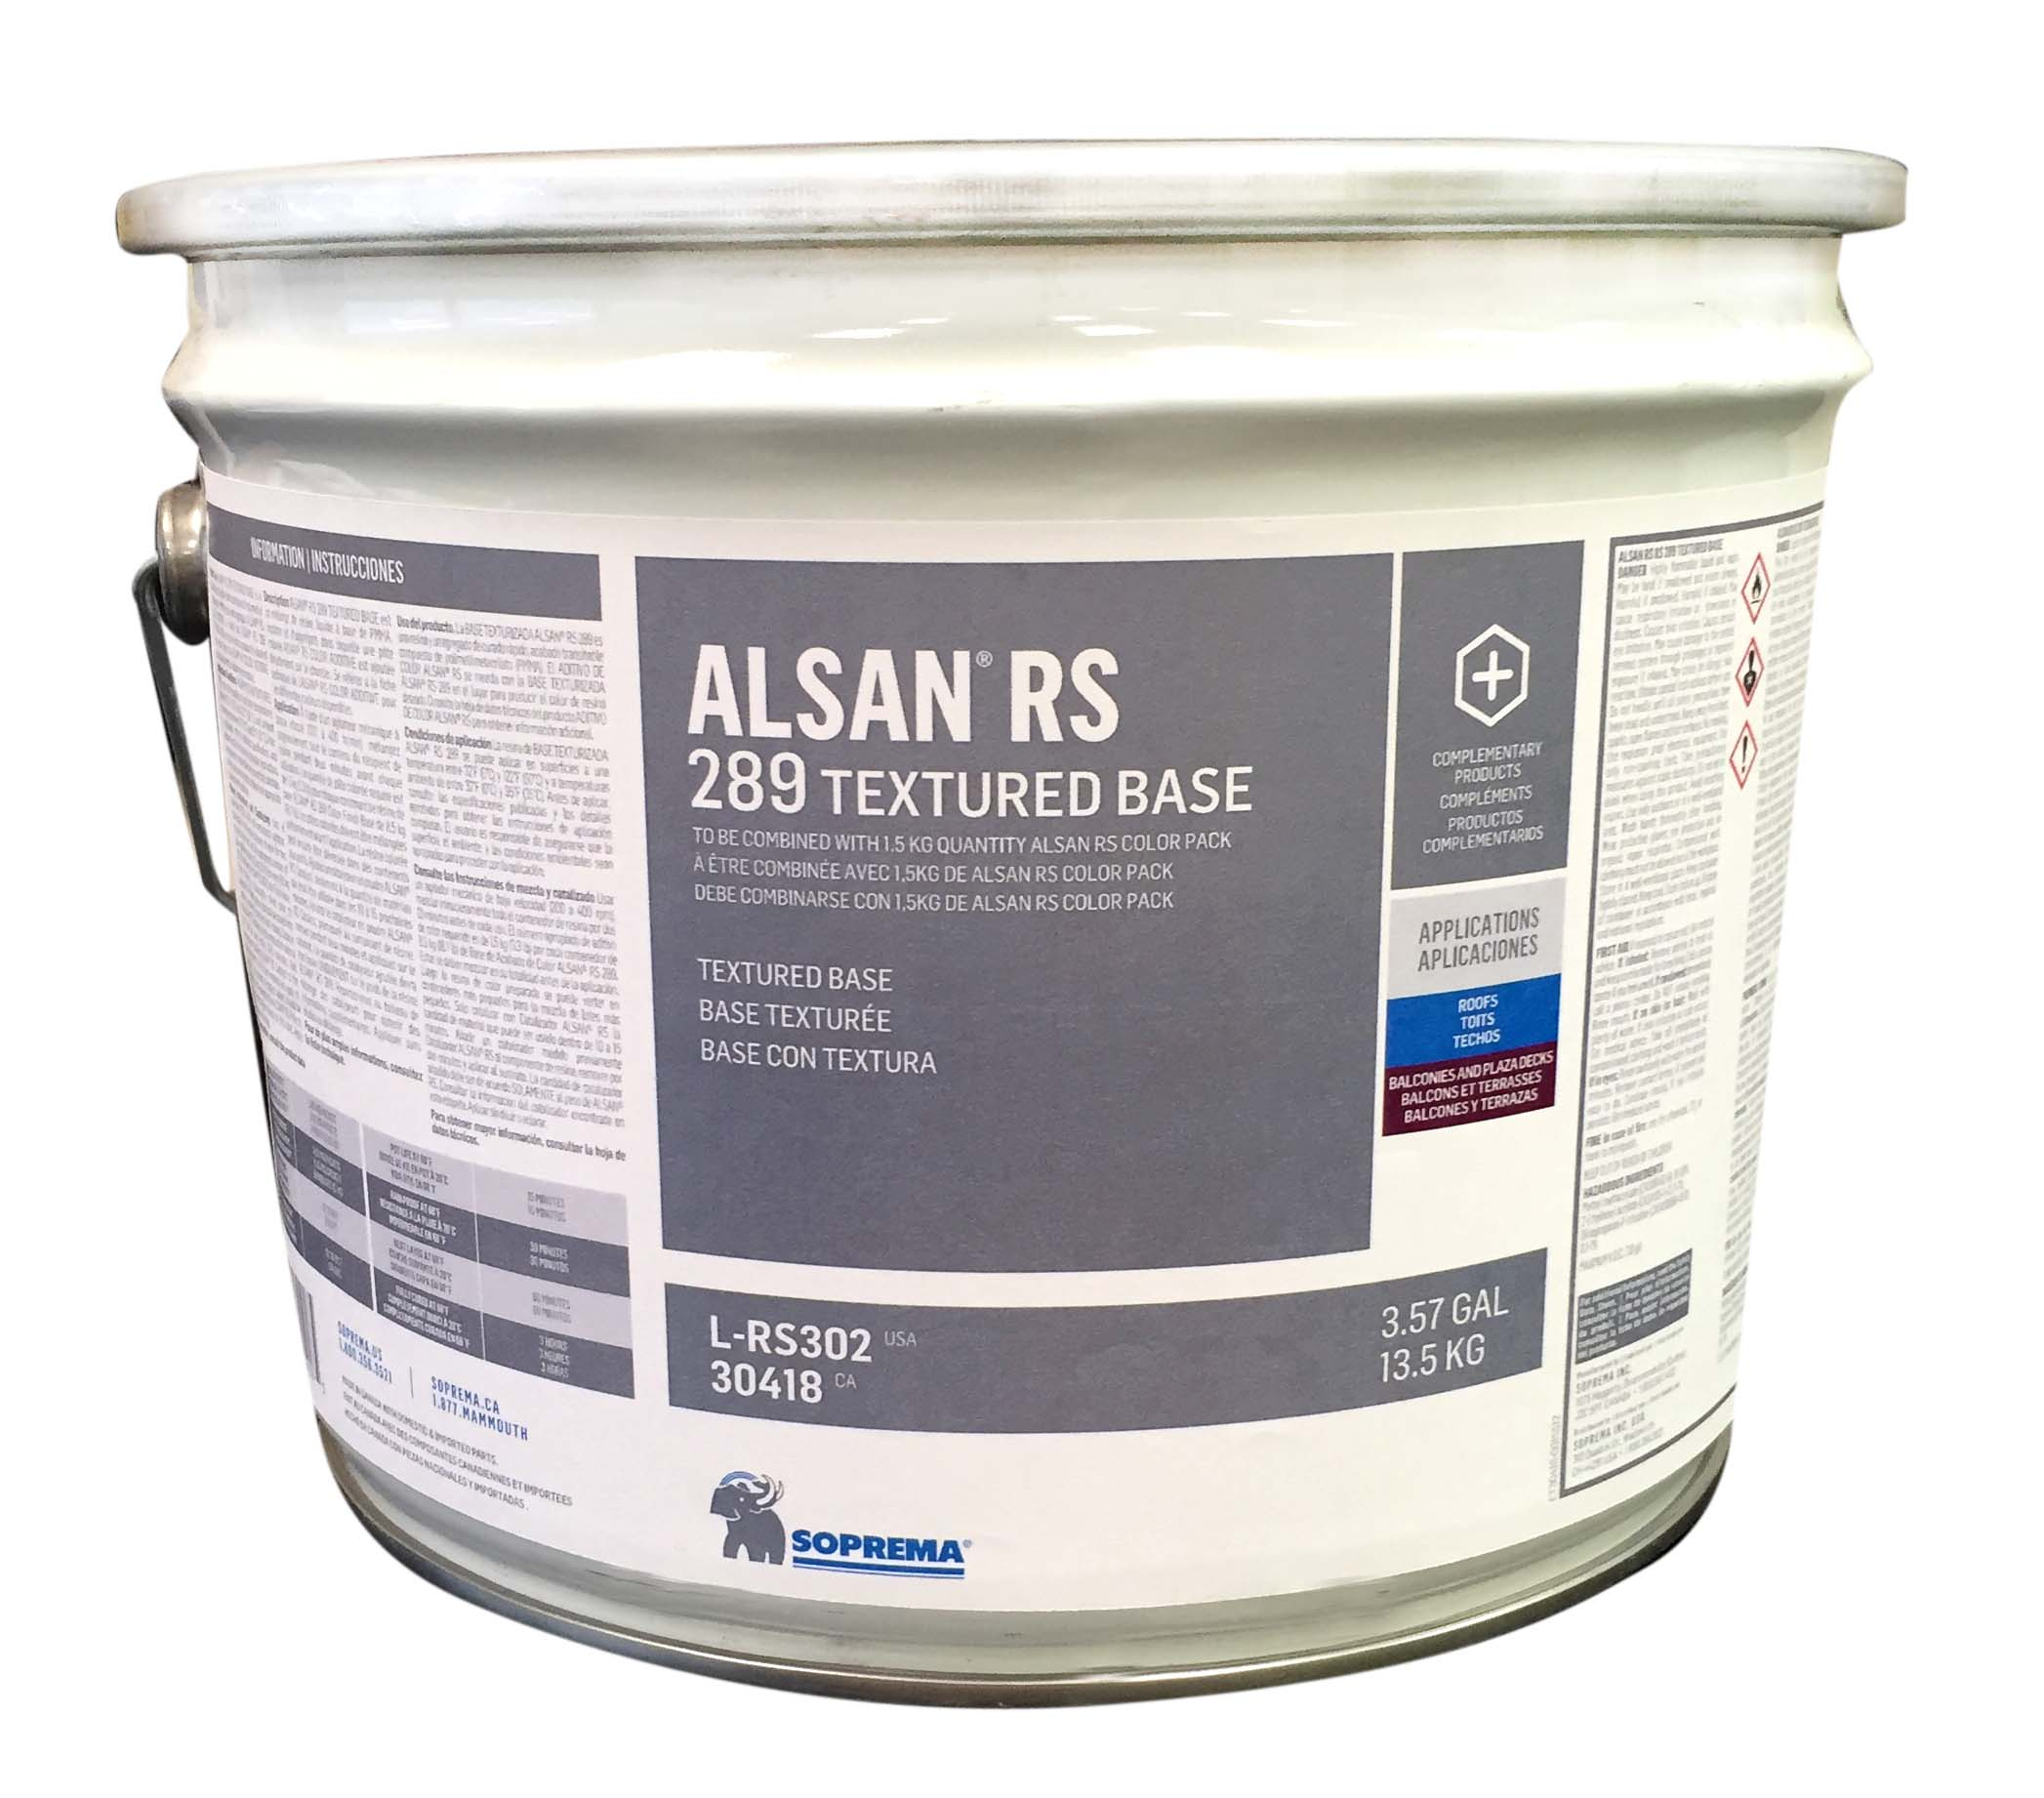 Alsan Rs 289 Textured Base Soprema